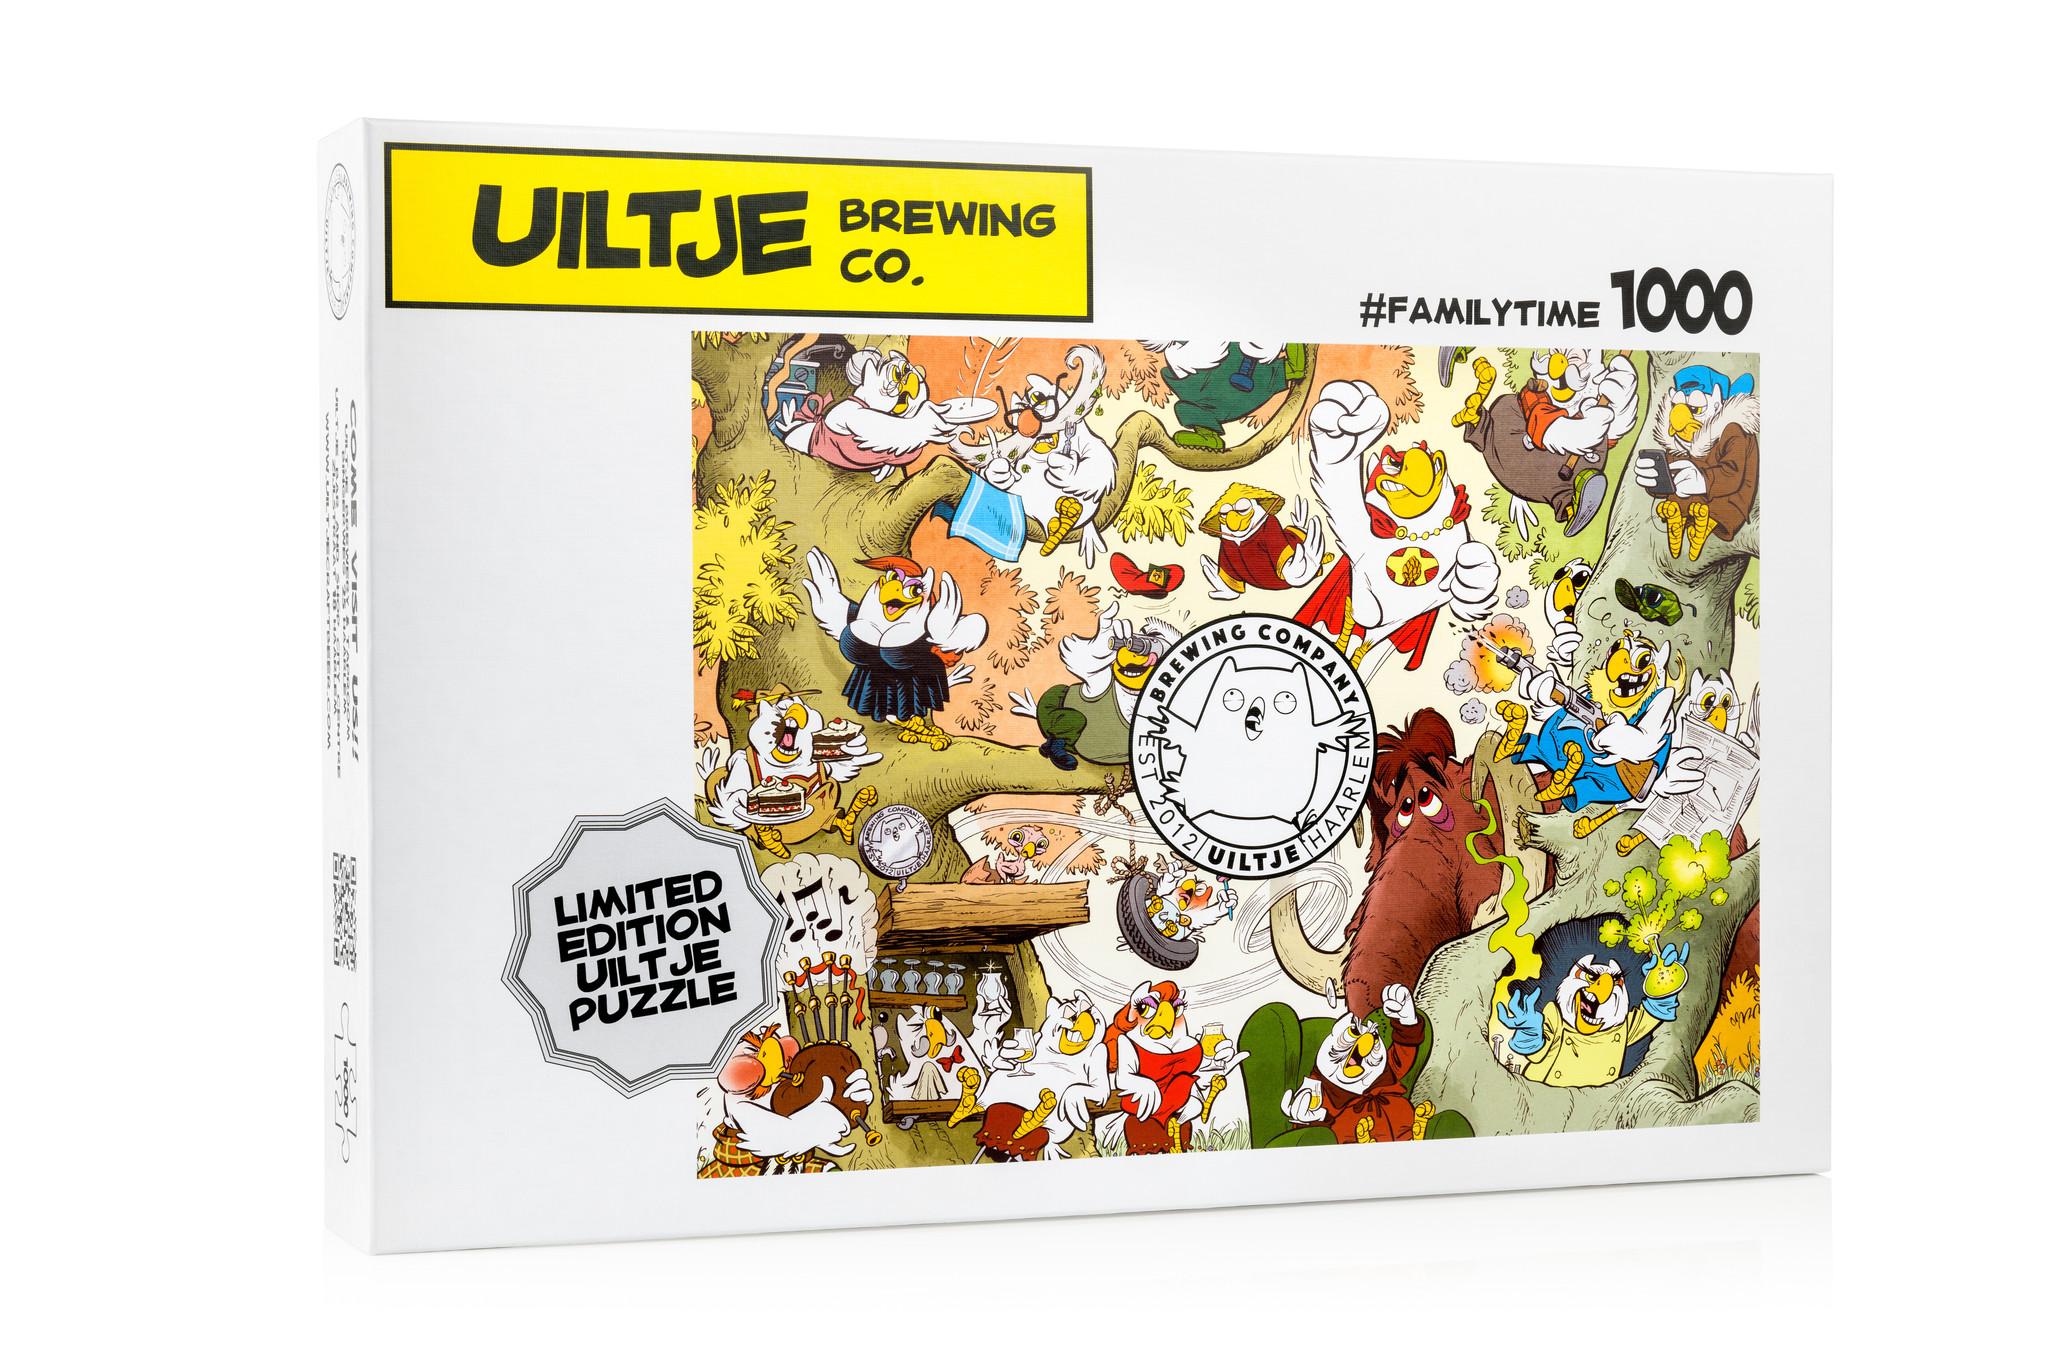 Uiltje- Limited Edition Puzzel